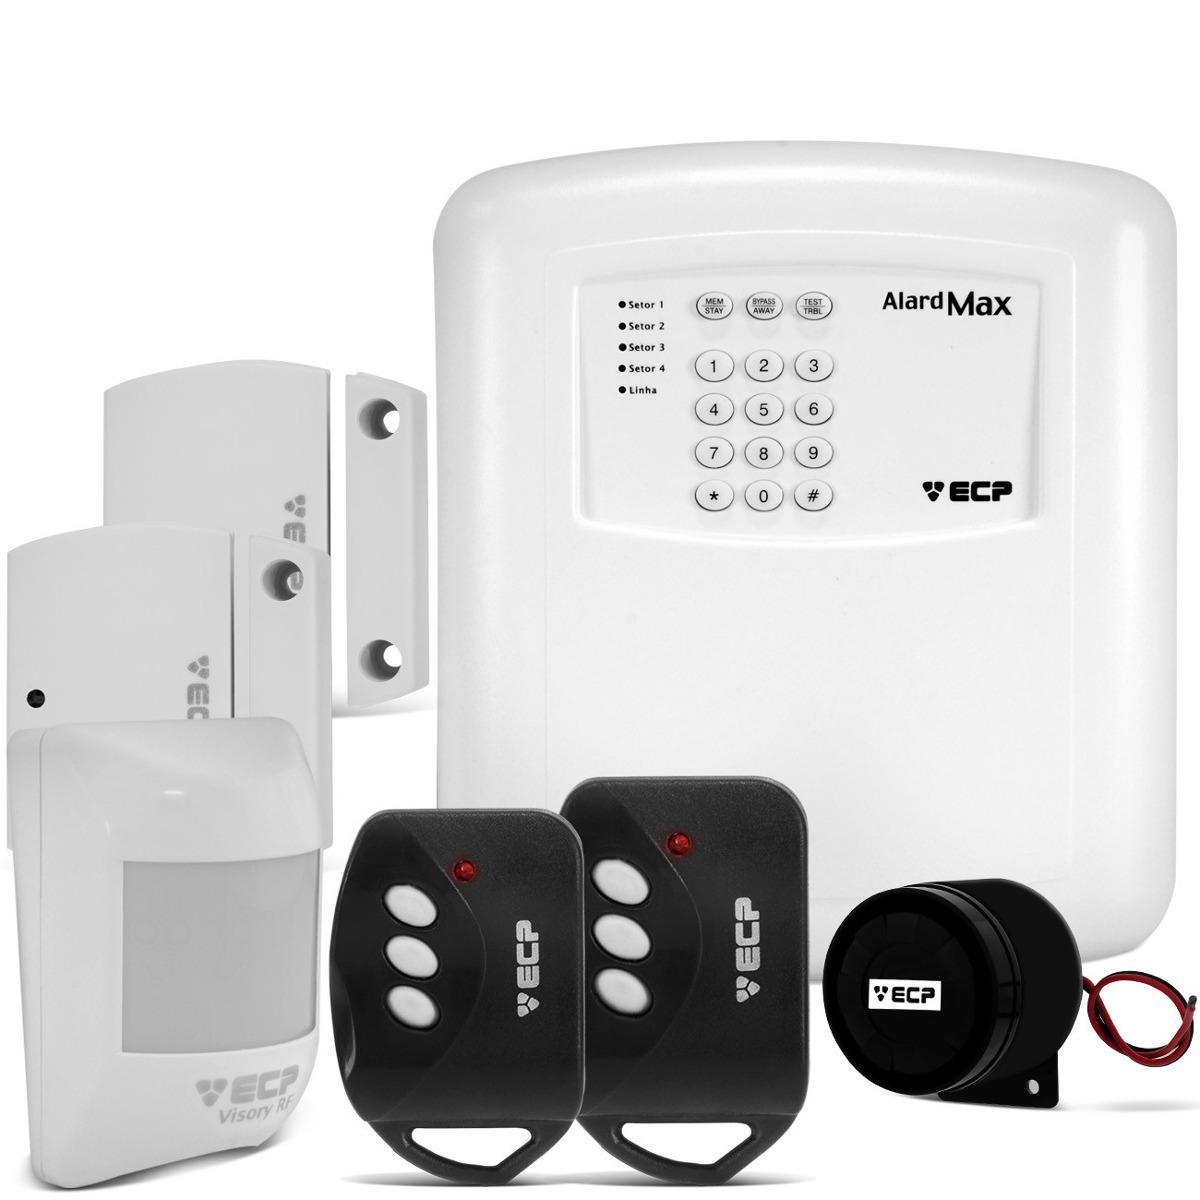 alarme residencial comercial sem fio ecp alardmax 4 zona iso r 189 90 em mercado livre. Black Bedroom Furniture Sets. Home Design Ideas